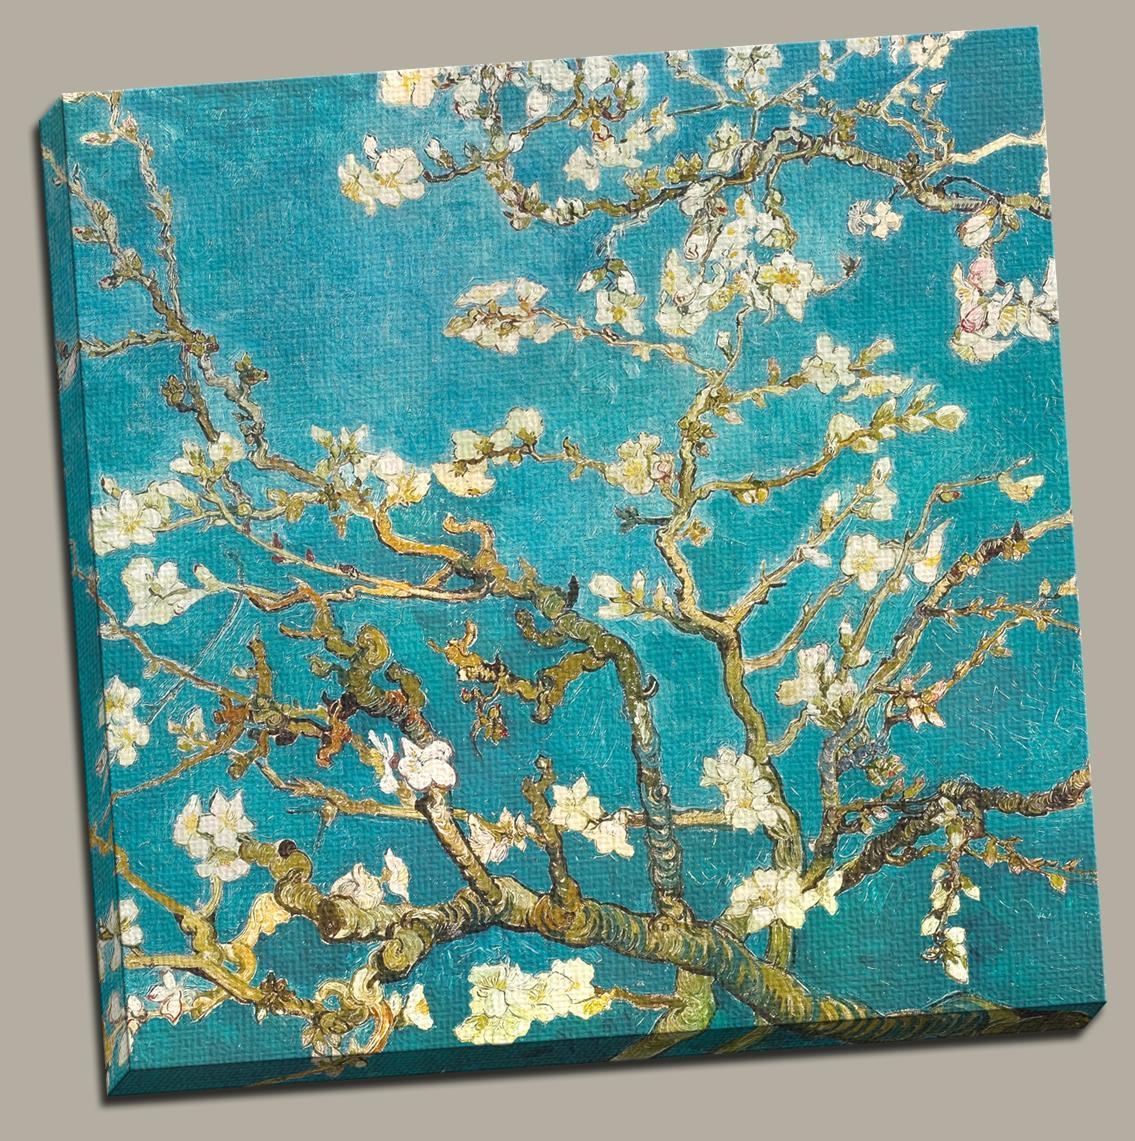 Vincent van gogh;painting;print;canvas;wall art;green